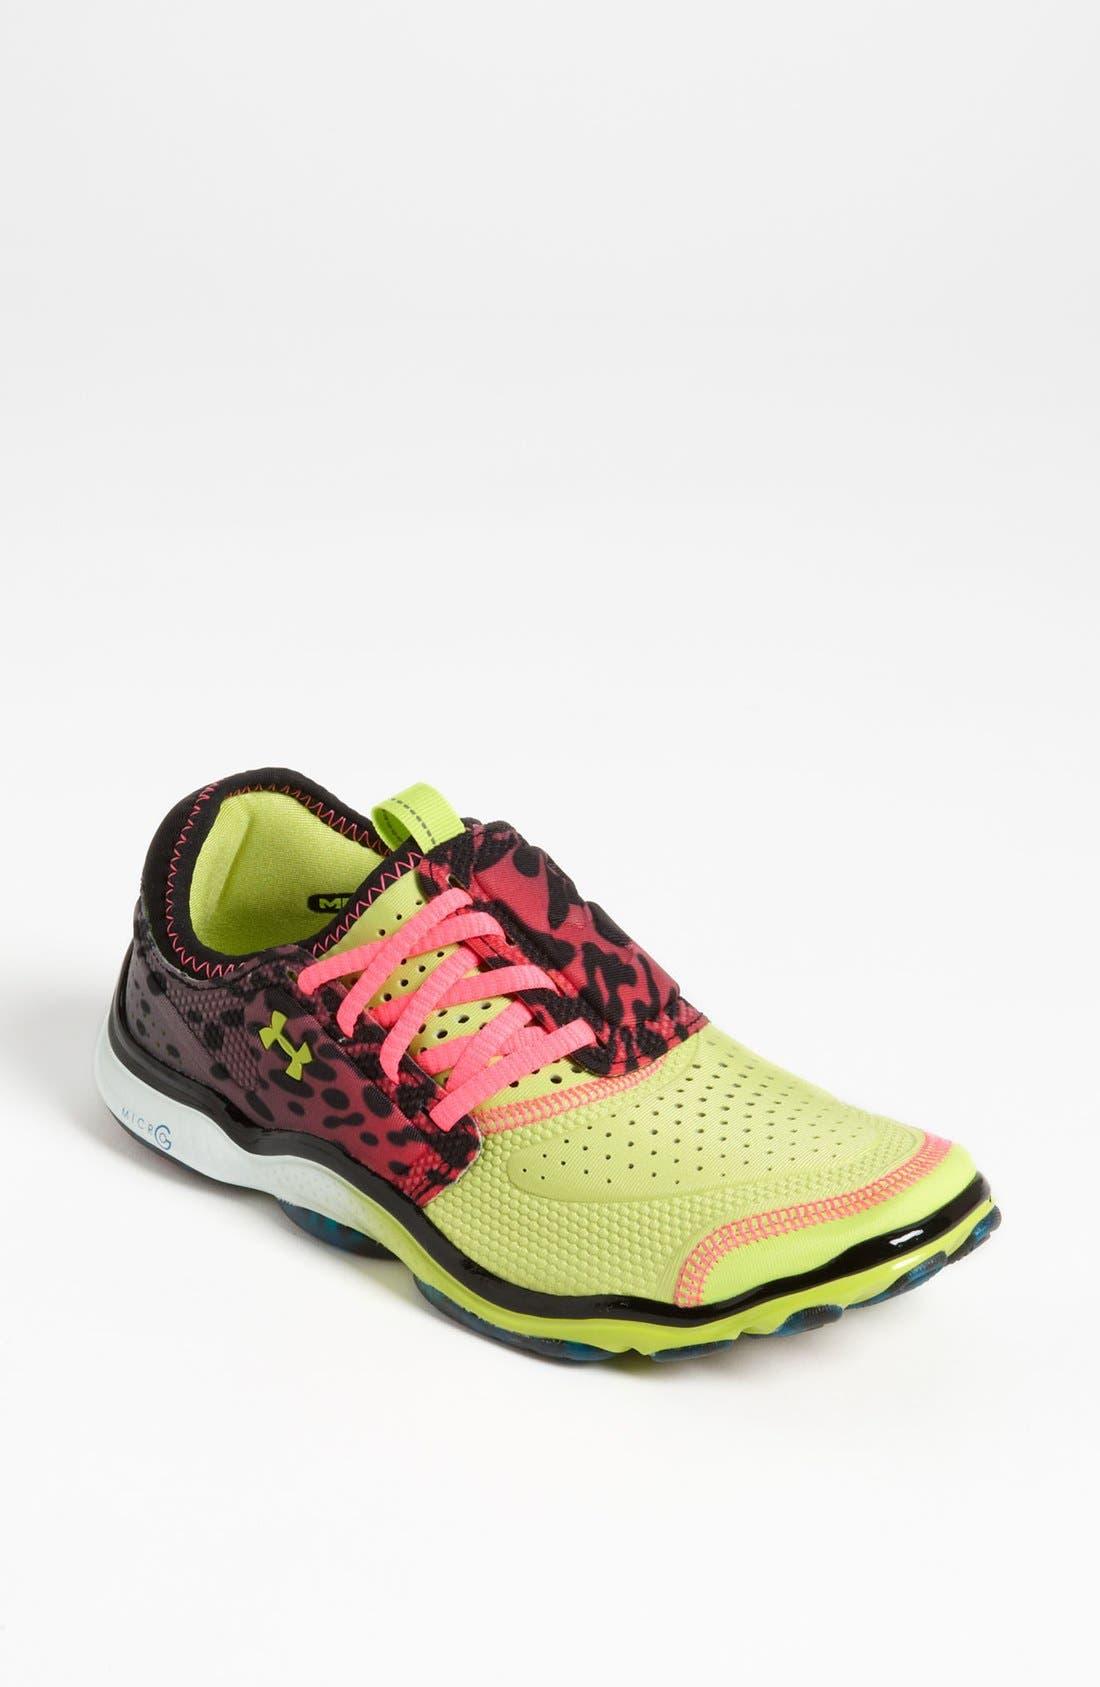 Main Image - Under Armour 'Micro G® Toxic' Running Shoe (Women)